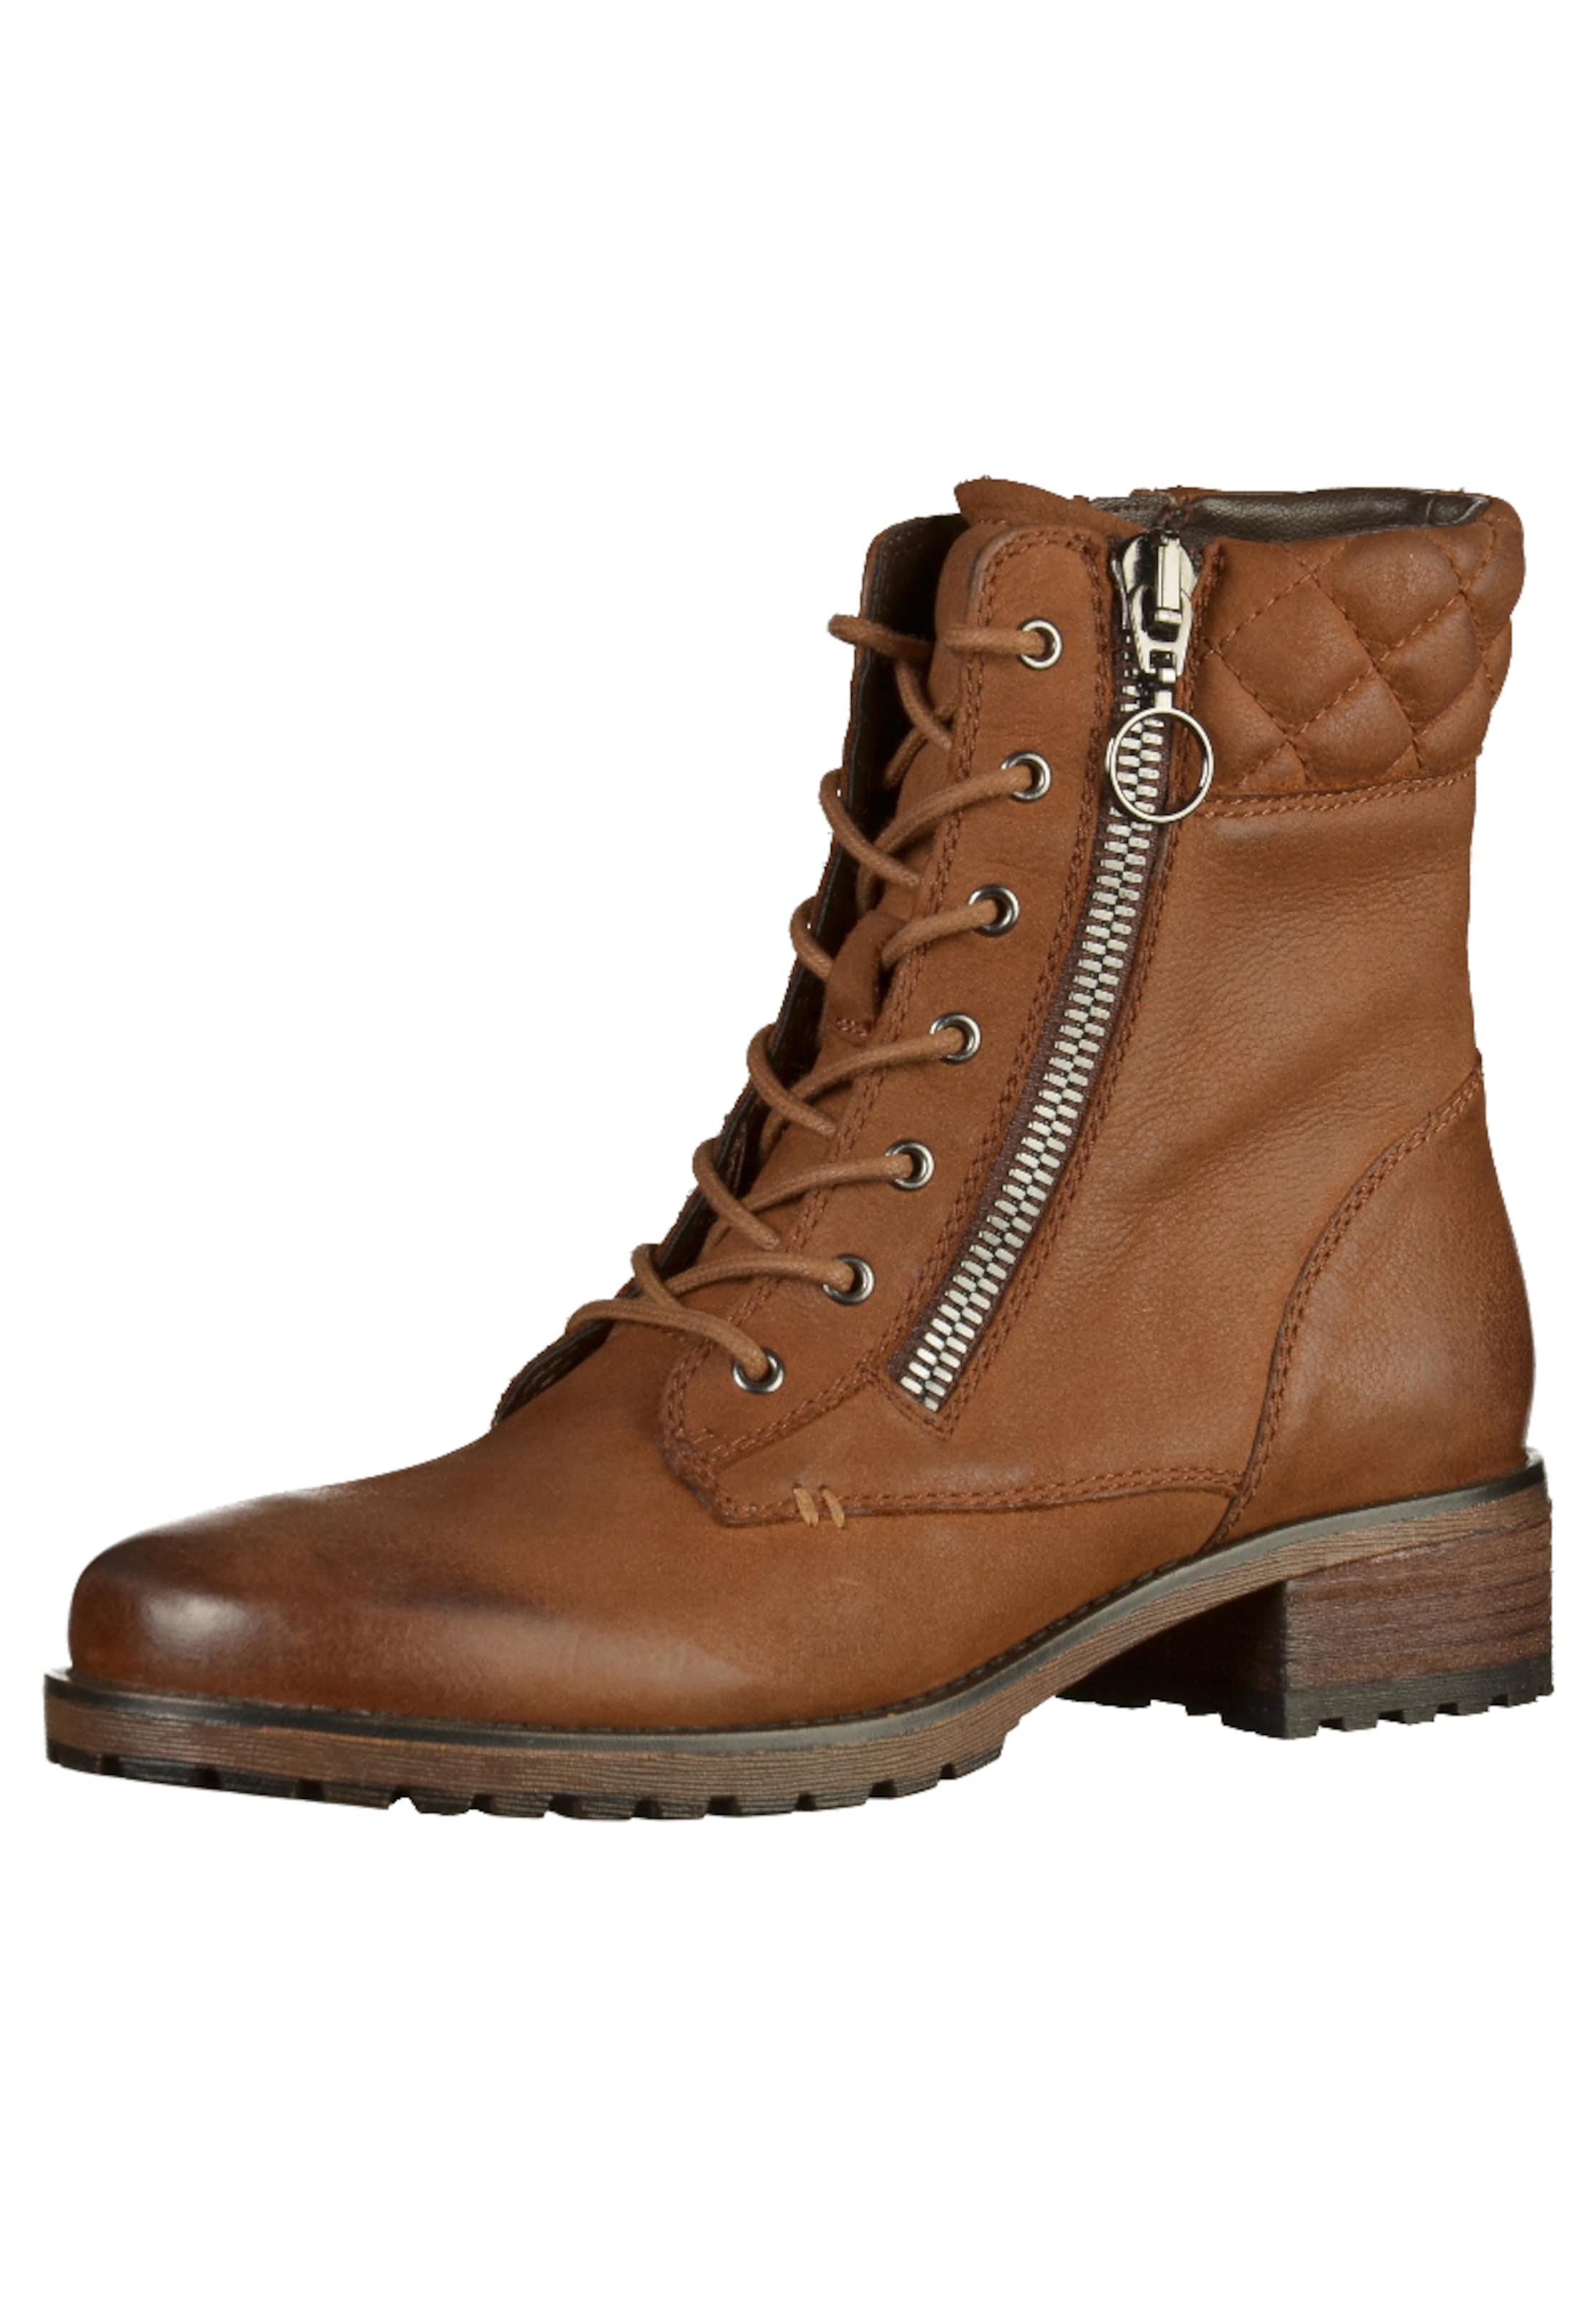 Haltbare Mode billige Schuhe SPM | Schnürstiefel 'Malou Lace' Schuhe Gut getragene Schuhe